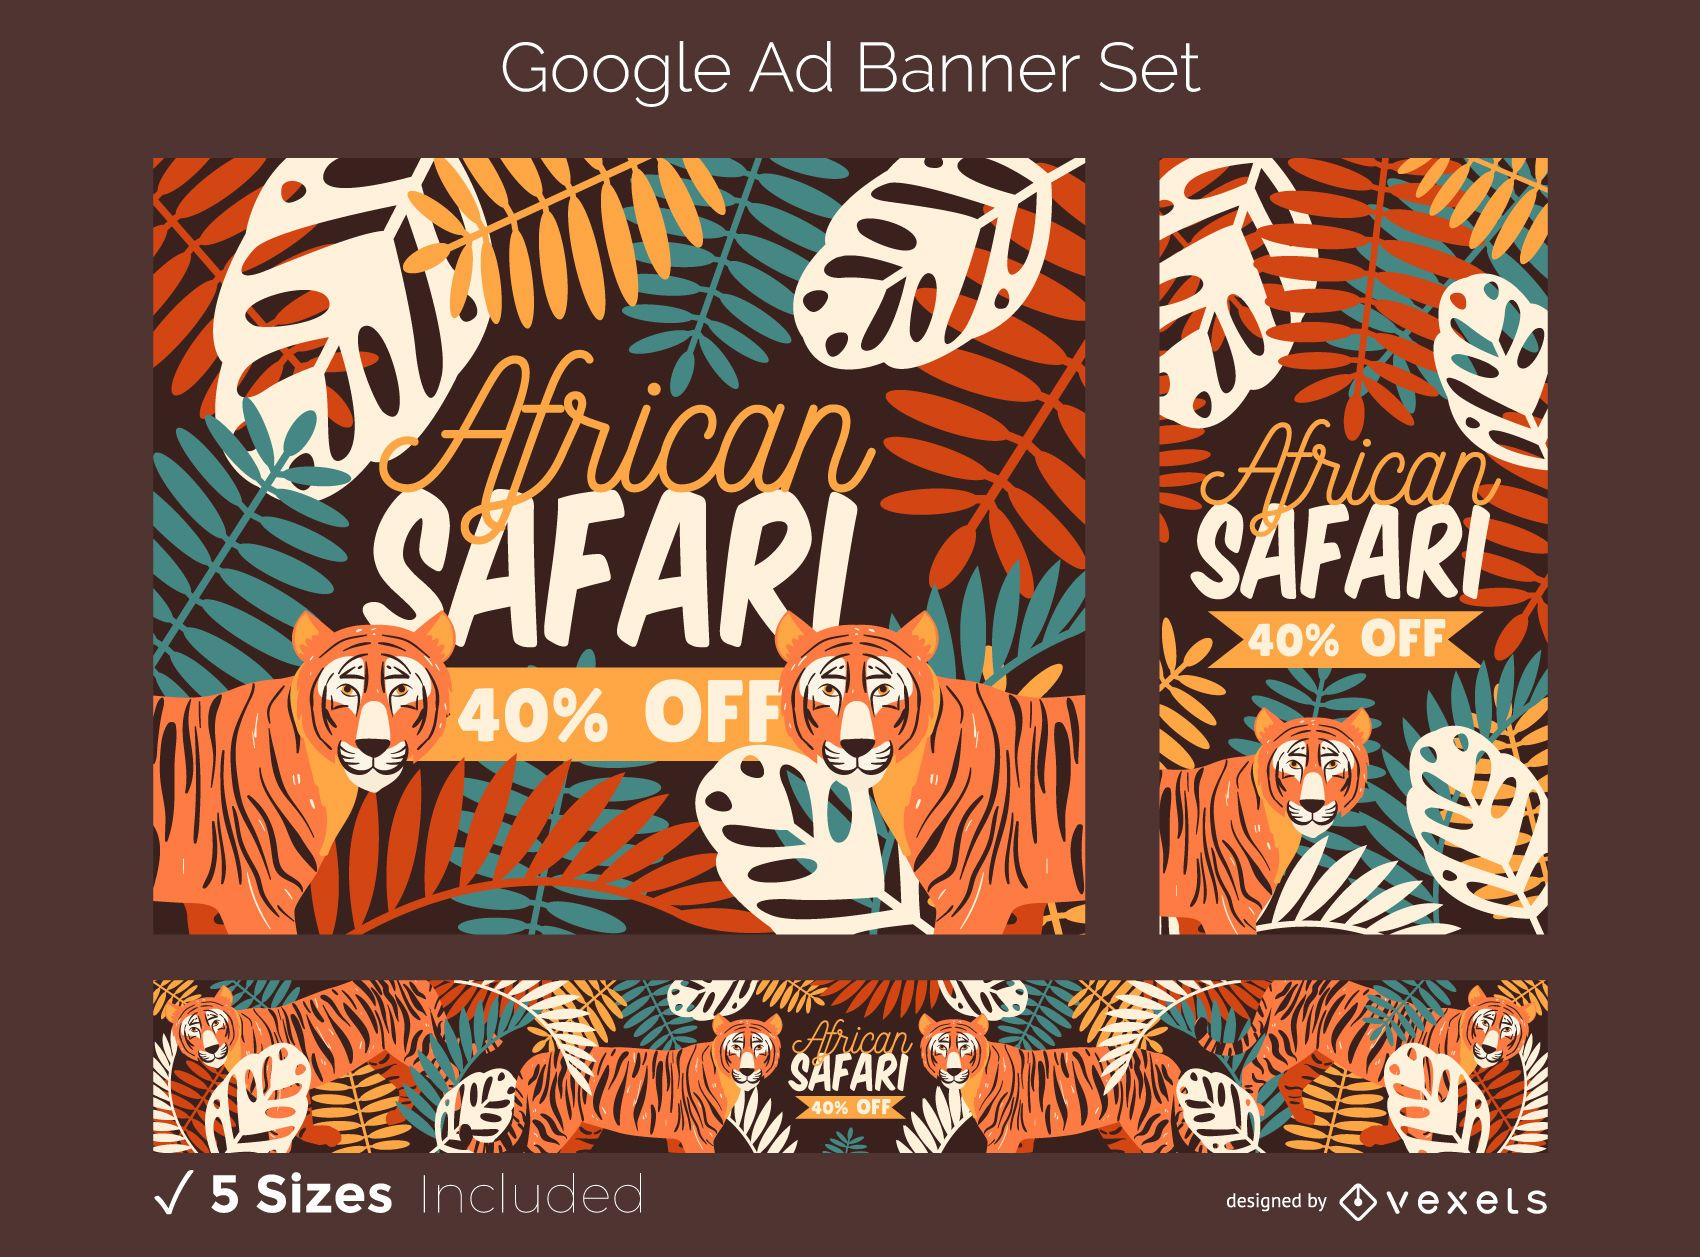 Conjunto de banners do Google Ads no Safari africano